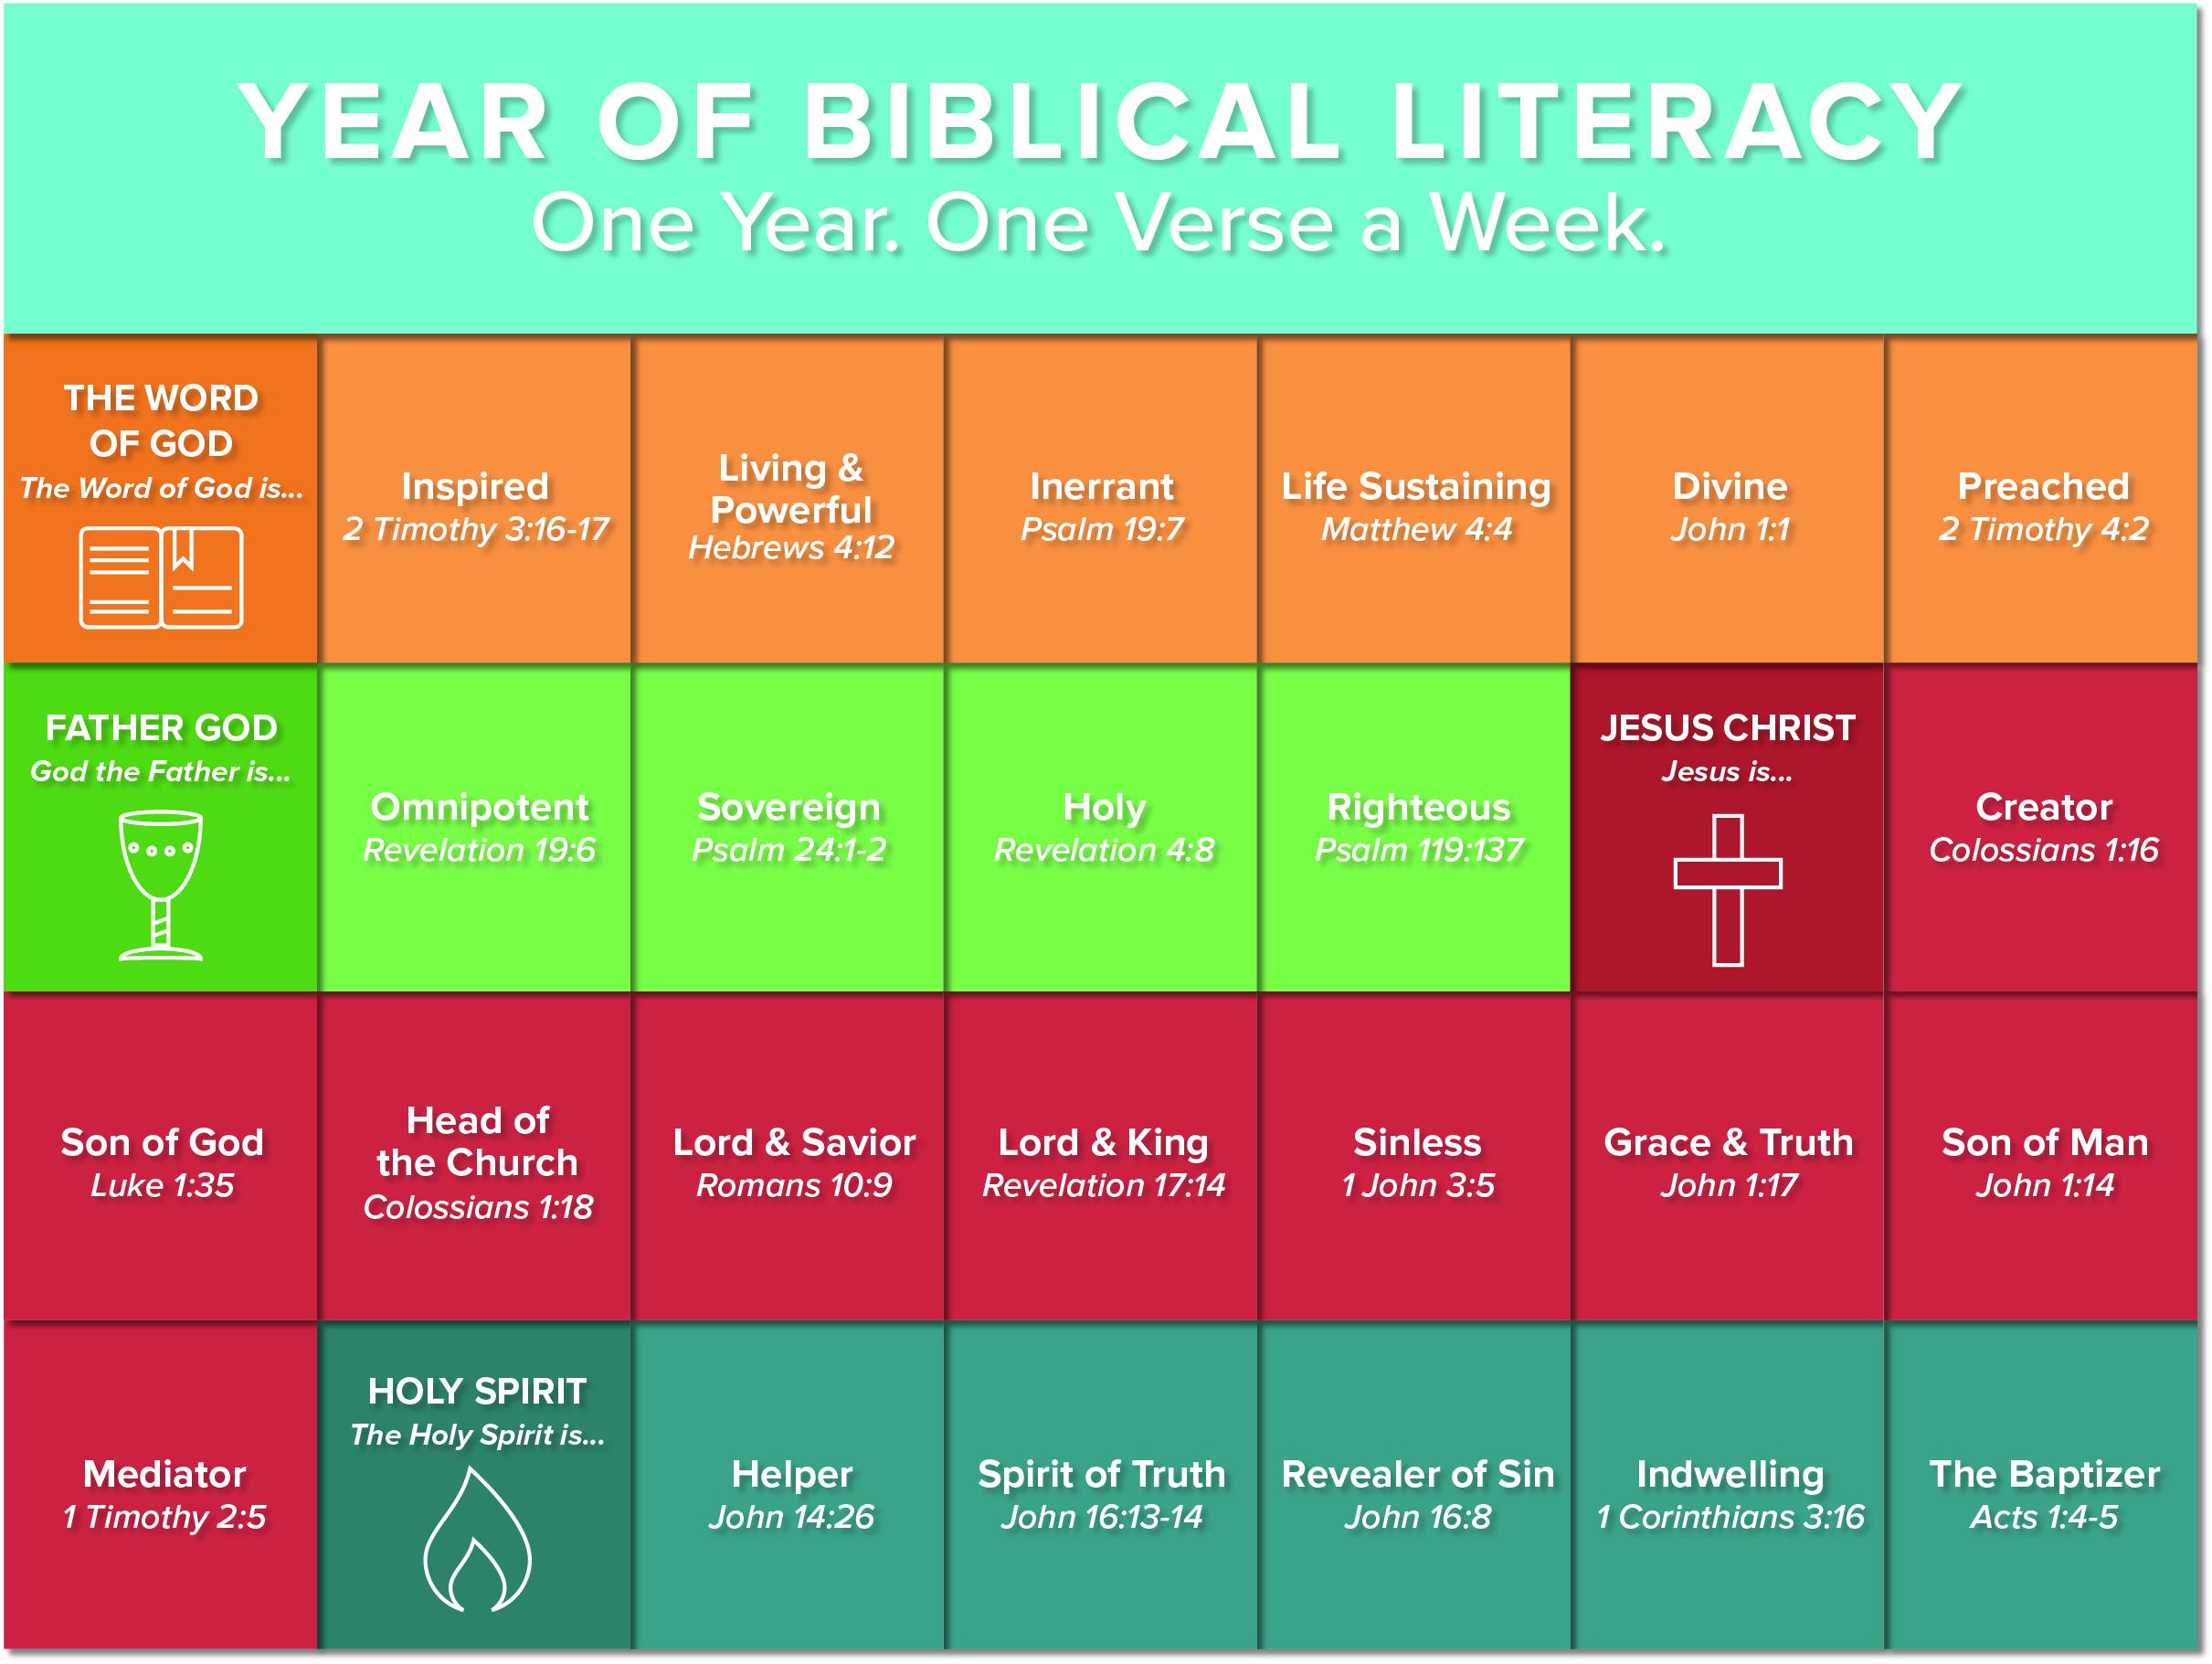 biblical-literacy_card-front.jpg